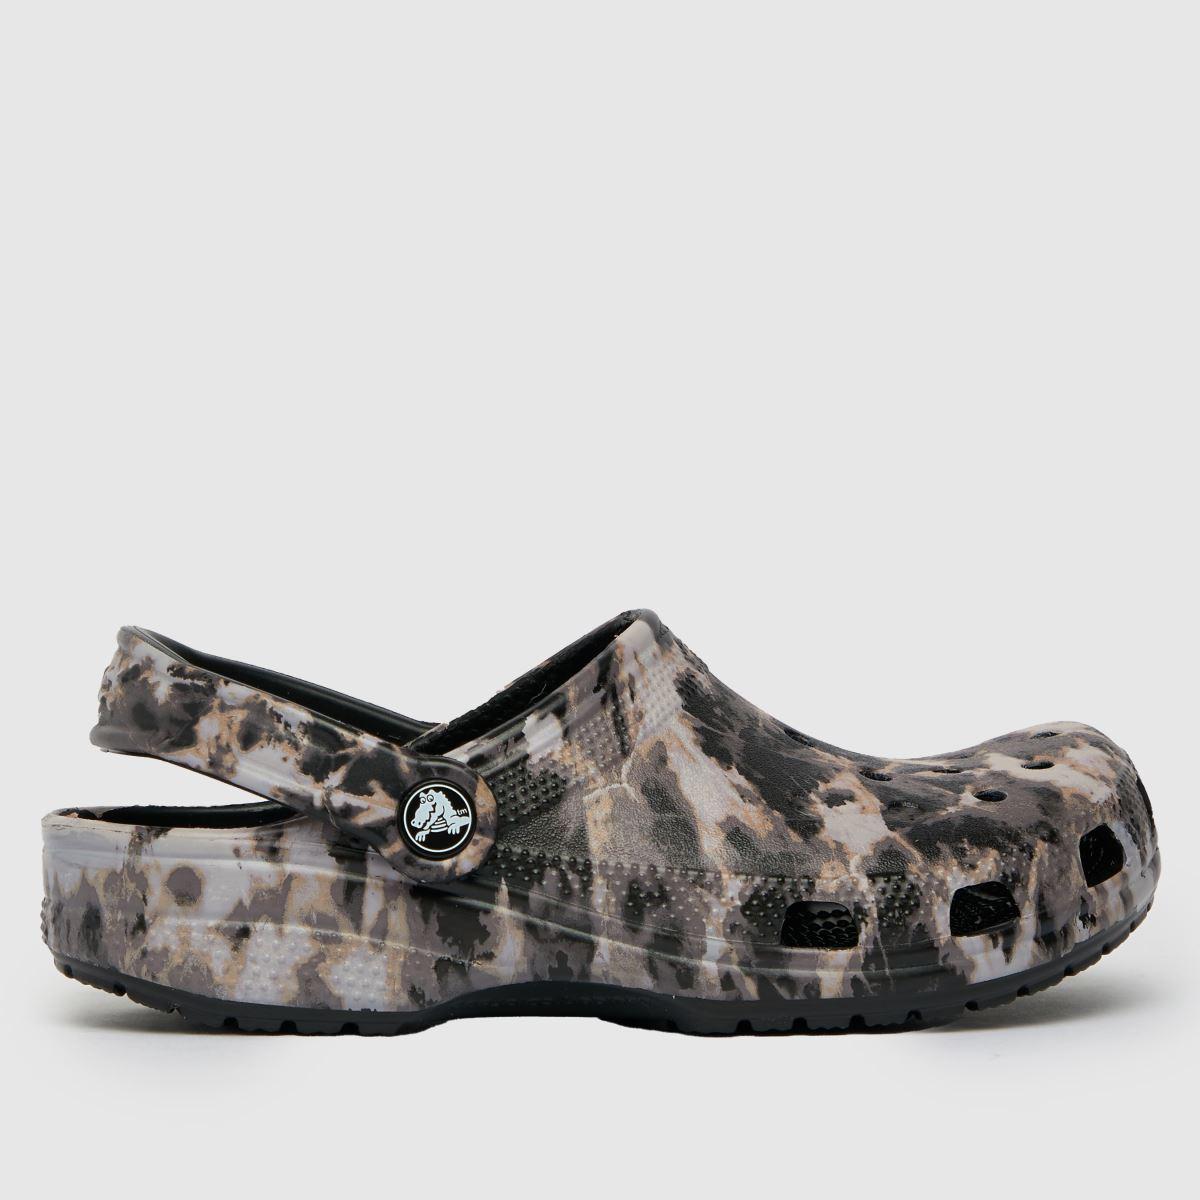 Crocs Black & White Beach Dye Clog Sandals